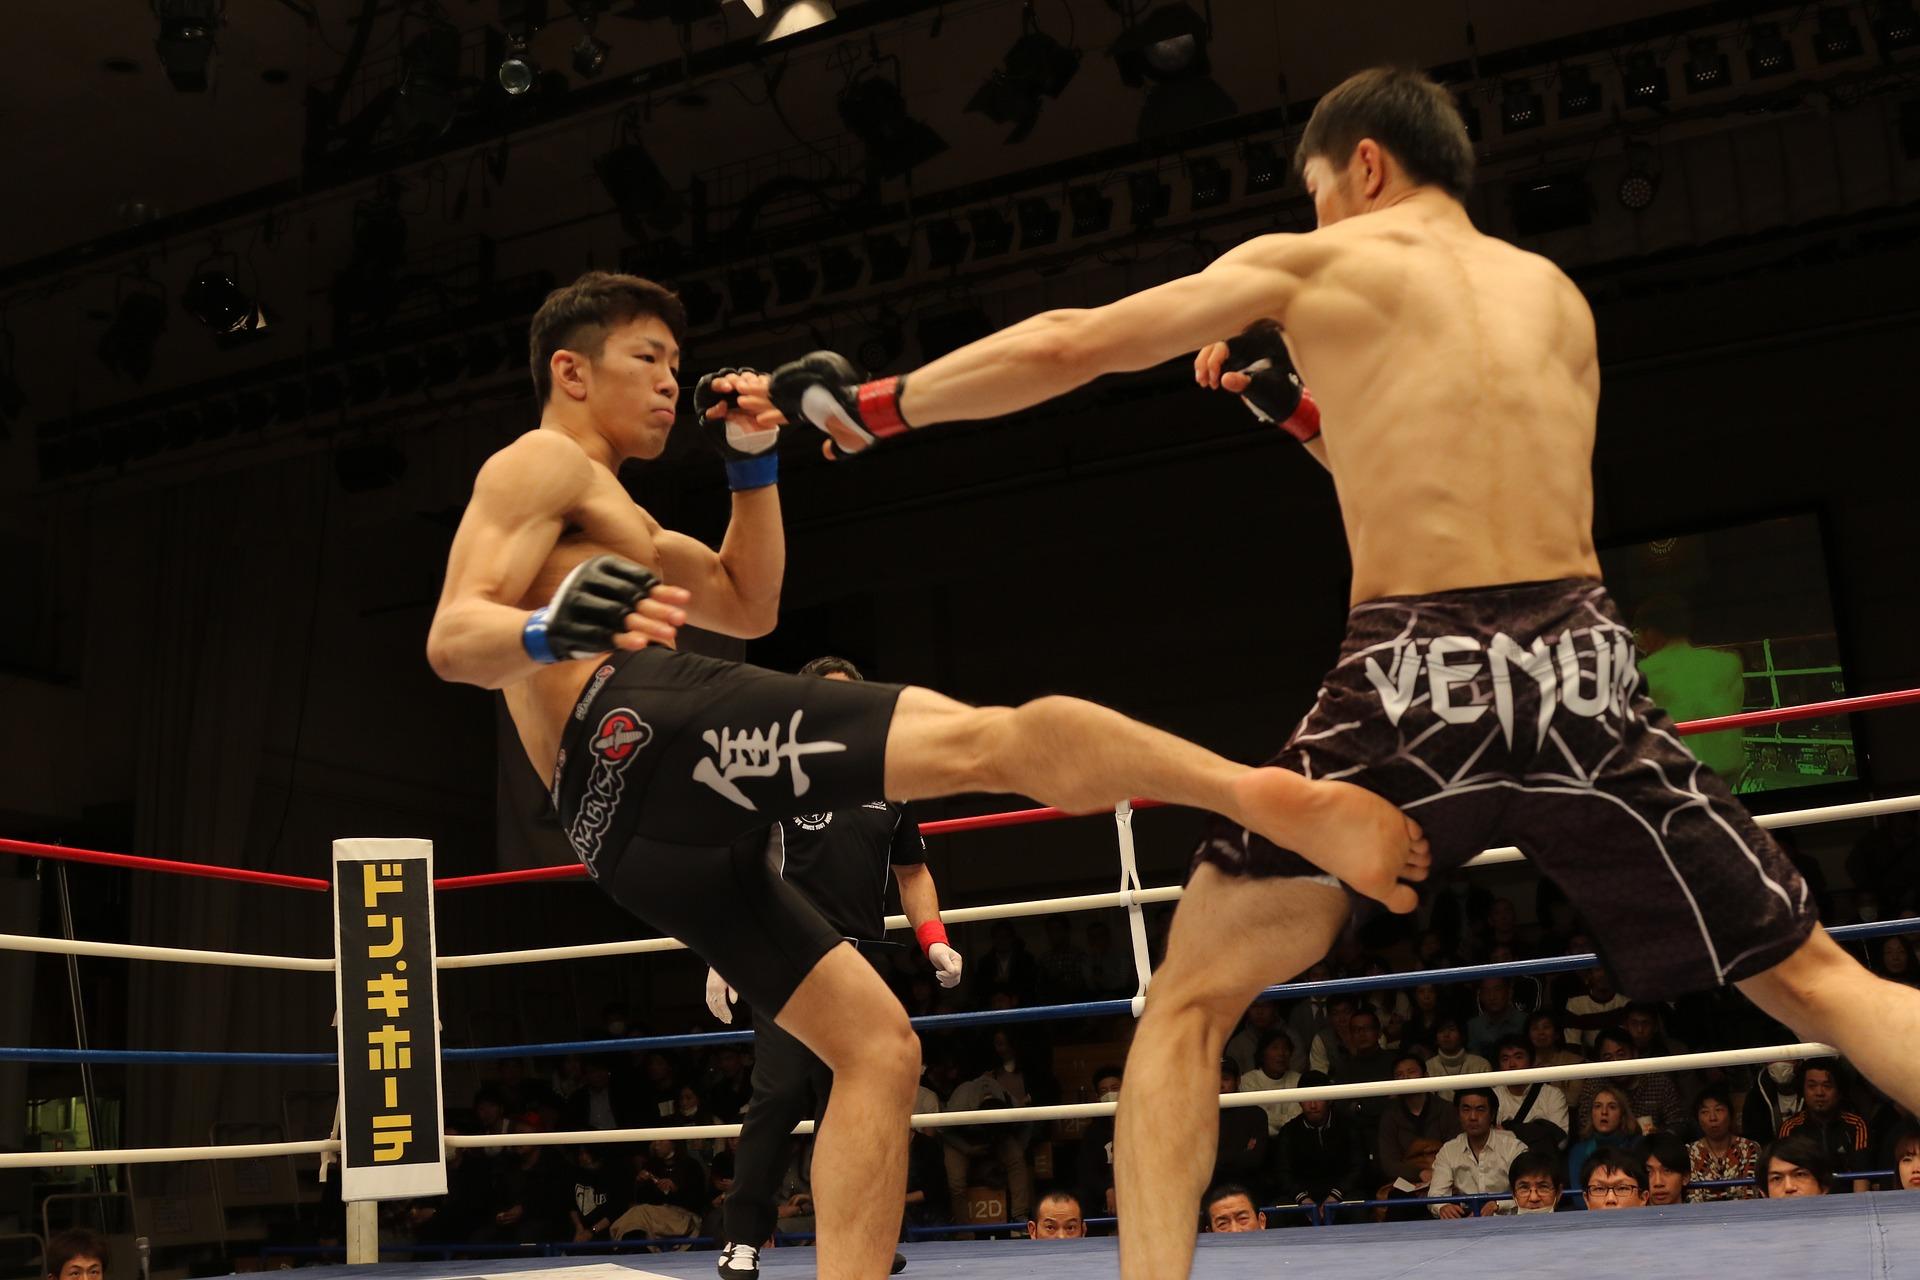 Striking in MMA